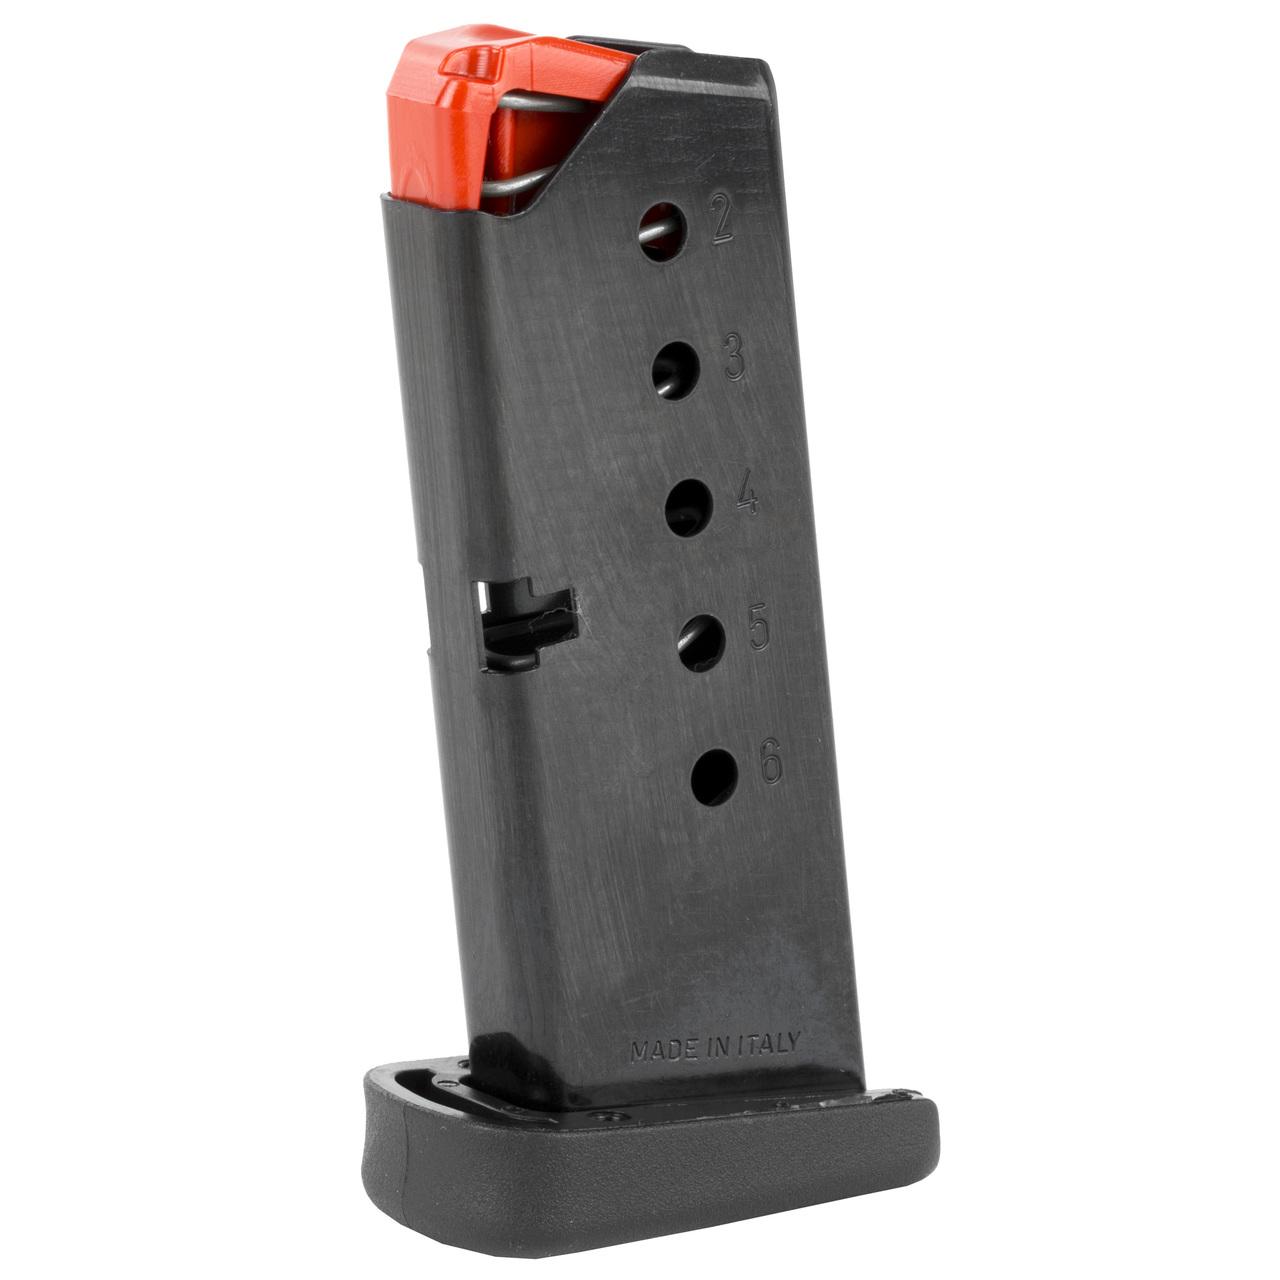 Gun Parts - Pistol Parts - Taurus Pistol Parts & Accessories - 2A